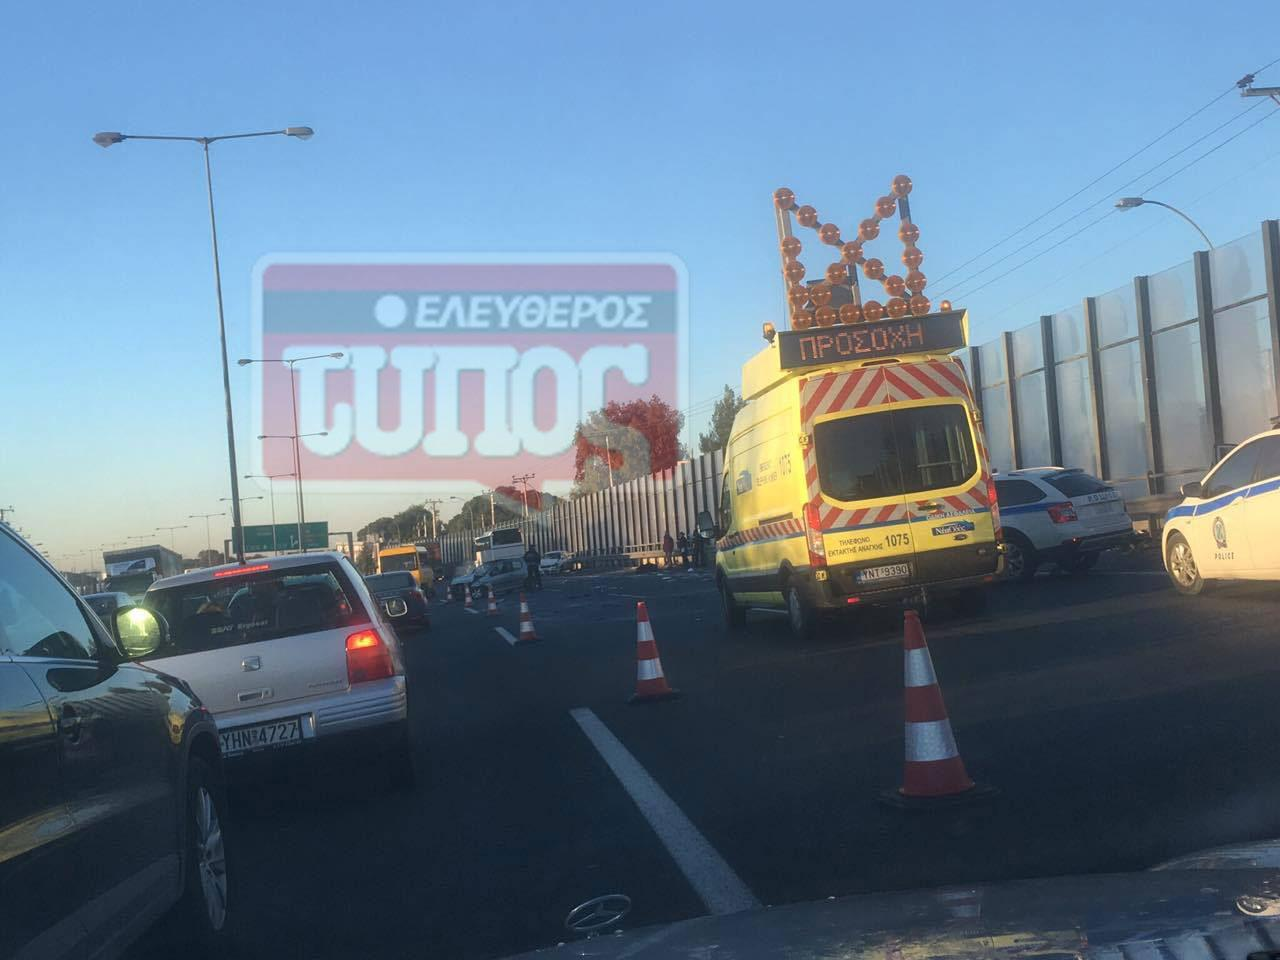 t5roxaio-ethinik-odos-traumaties-1300-3 Ατύχημα με τραυματία στην εθνική οδό: Μποτιλιάρισμα με ουρές χιλιομέτρων [εικόνες]